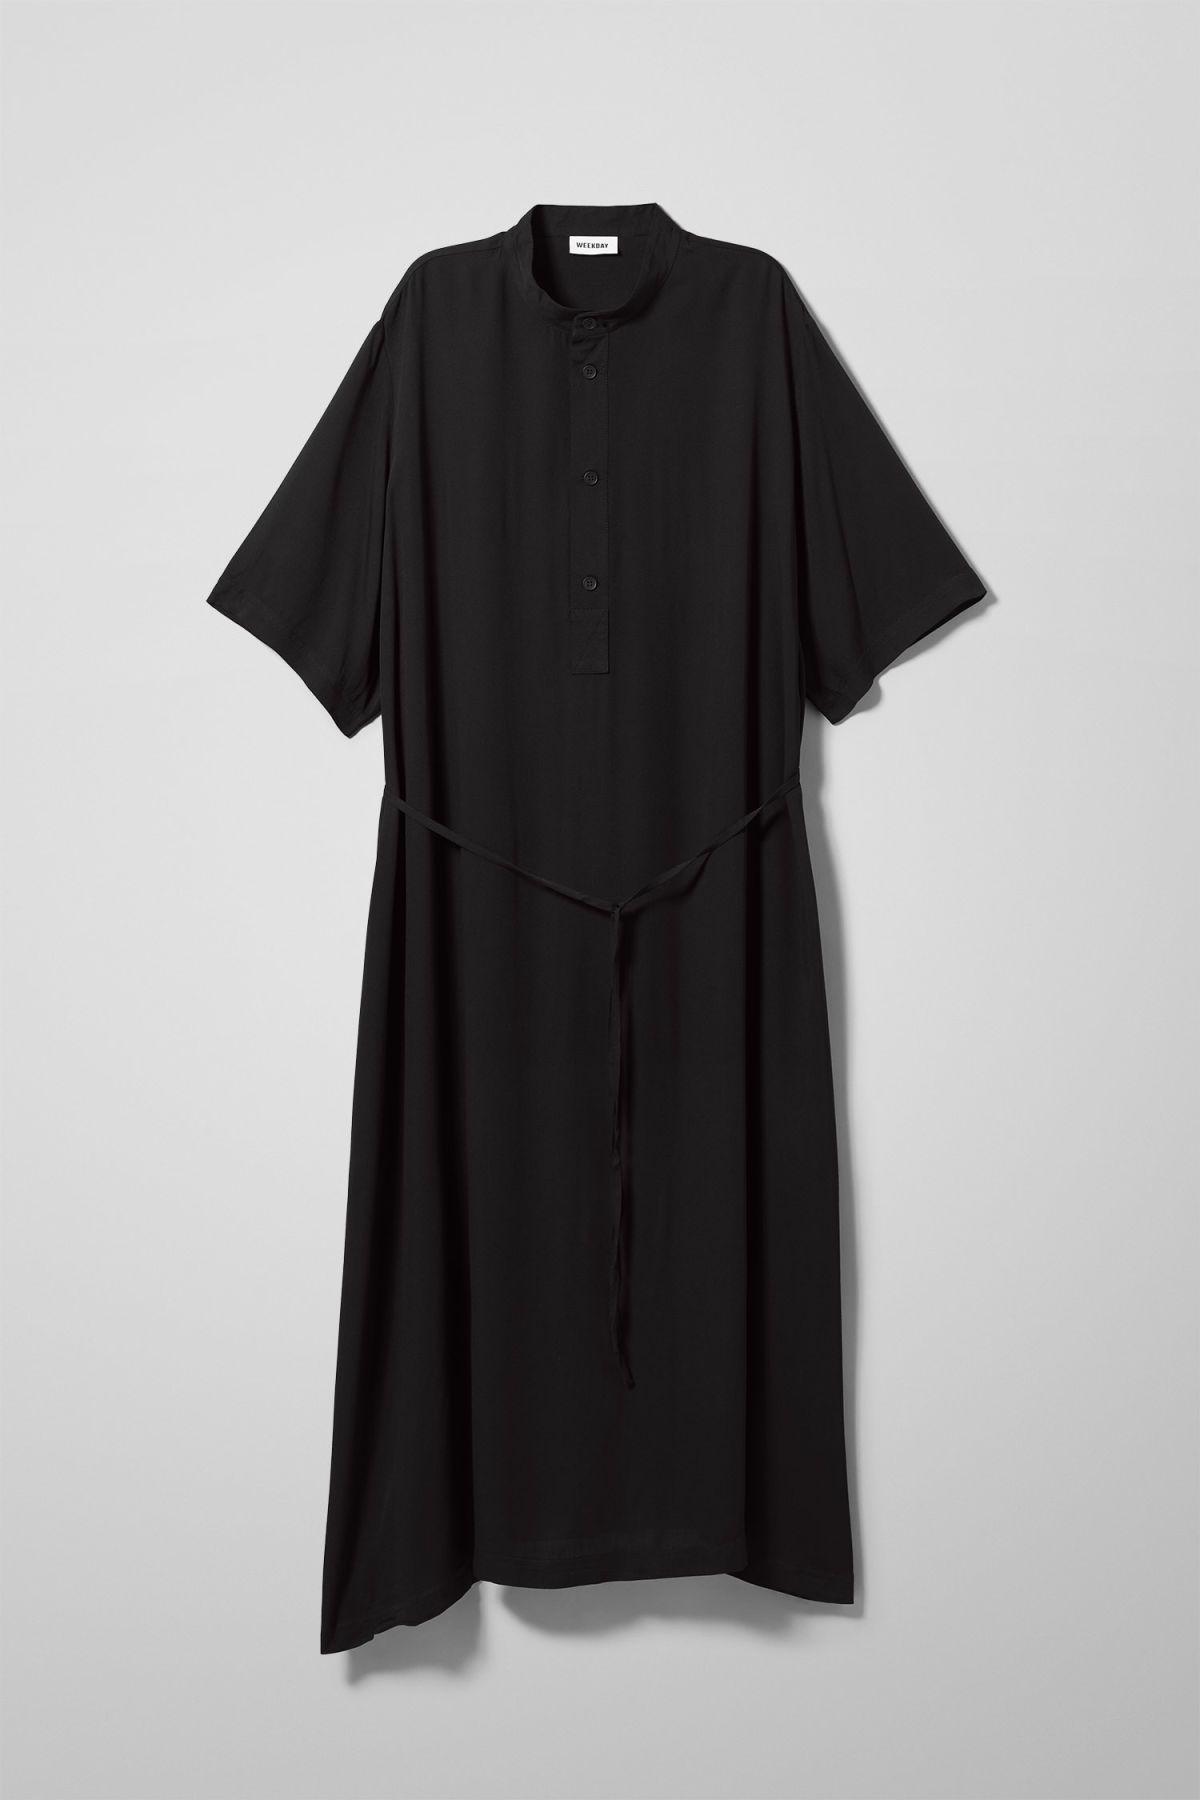 635c08708b Yana Dress - Blue - Dresses  amp  Jumpsuits - Weekday GB Jumpsuit Dress